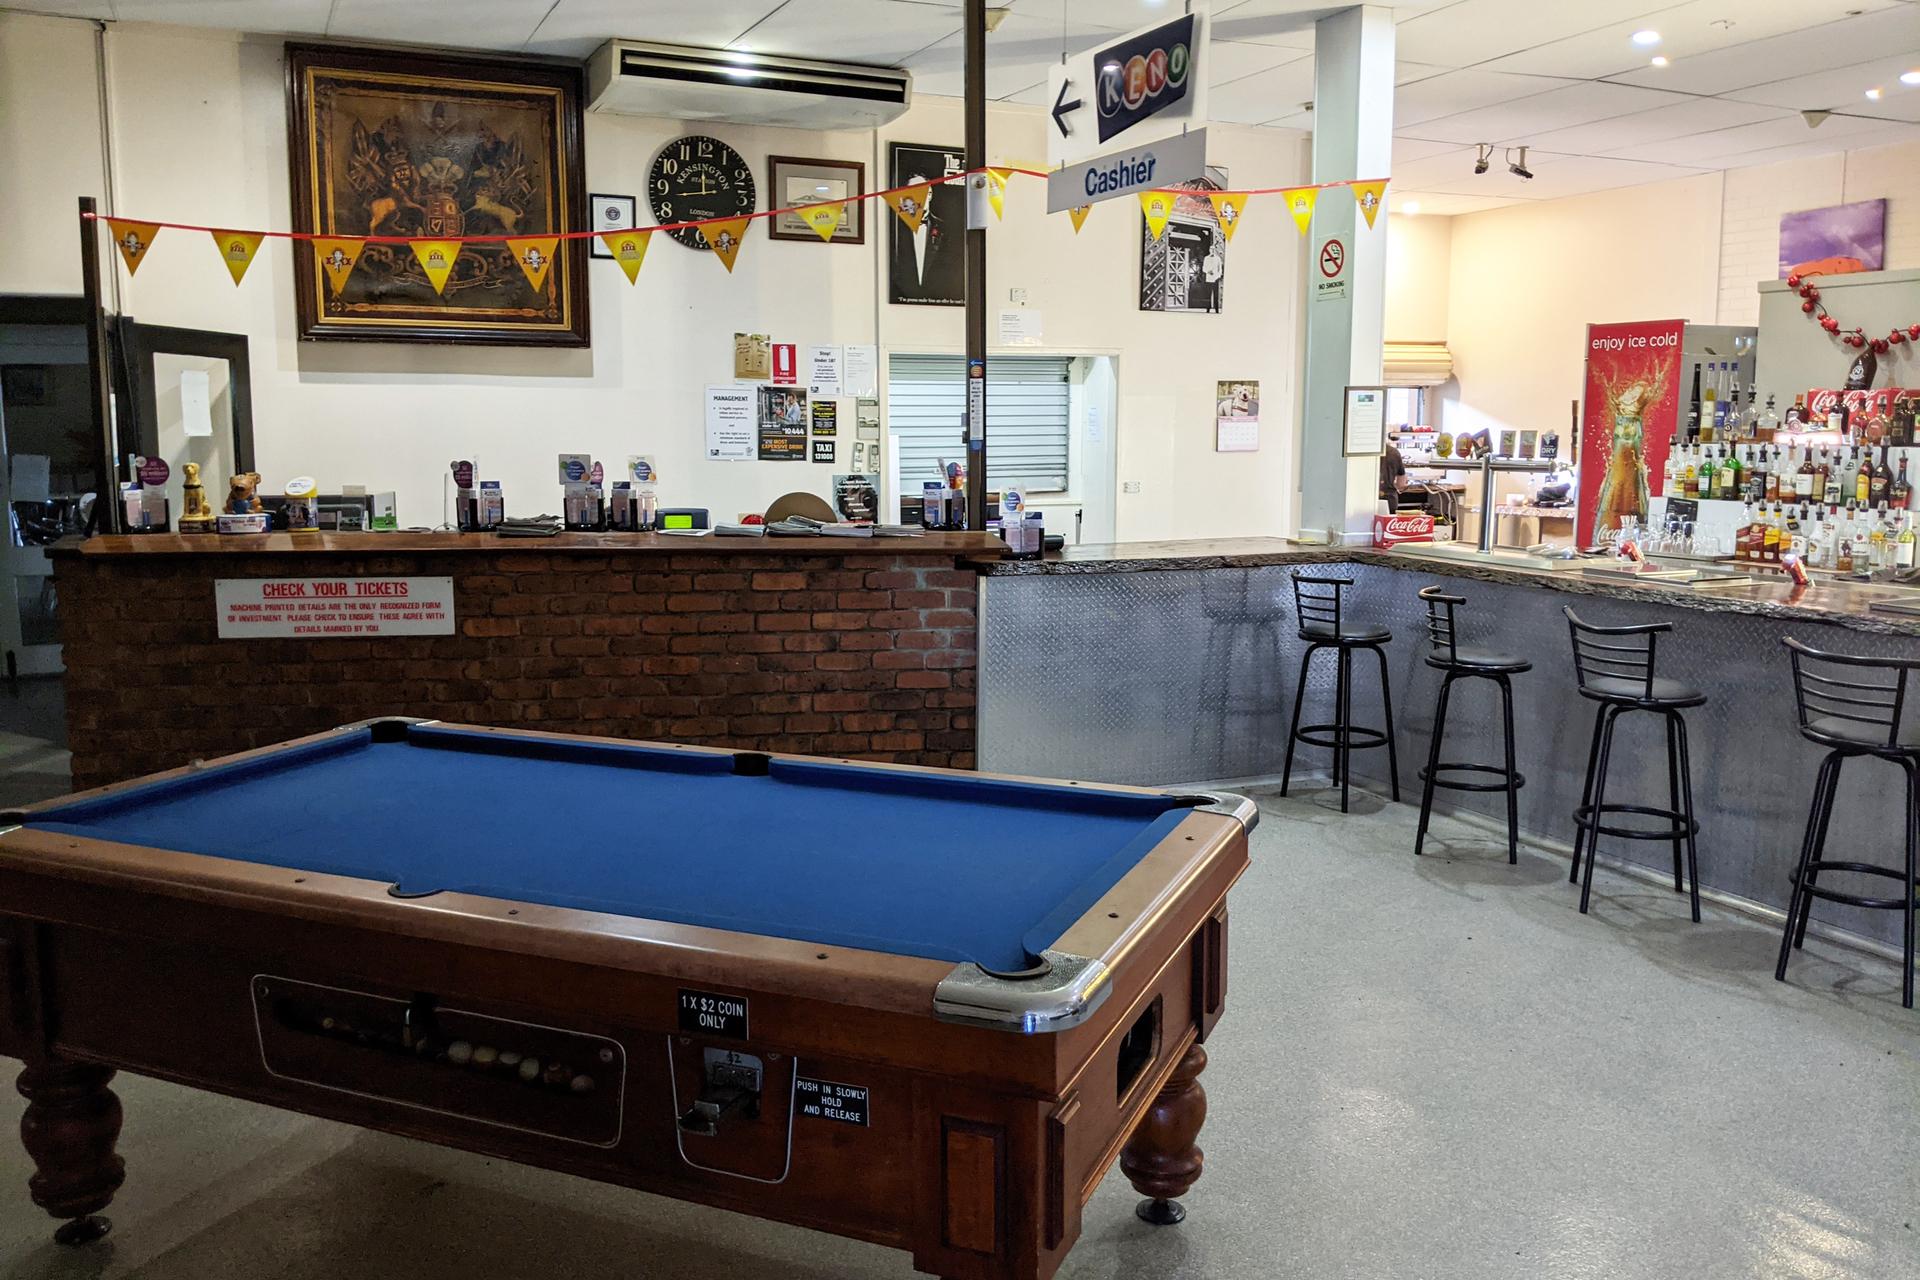 b - Granville Tavern and Motel